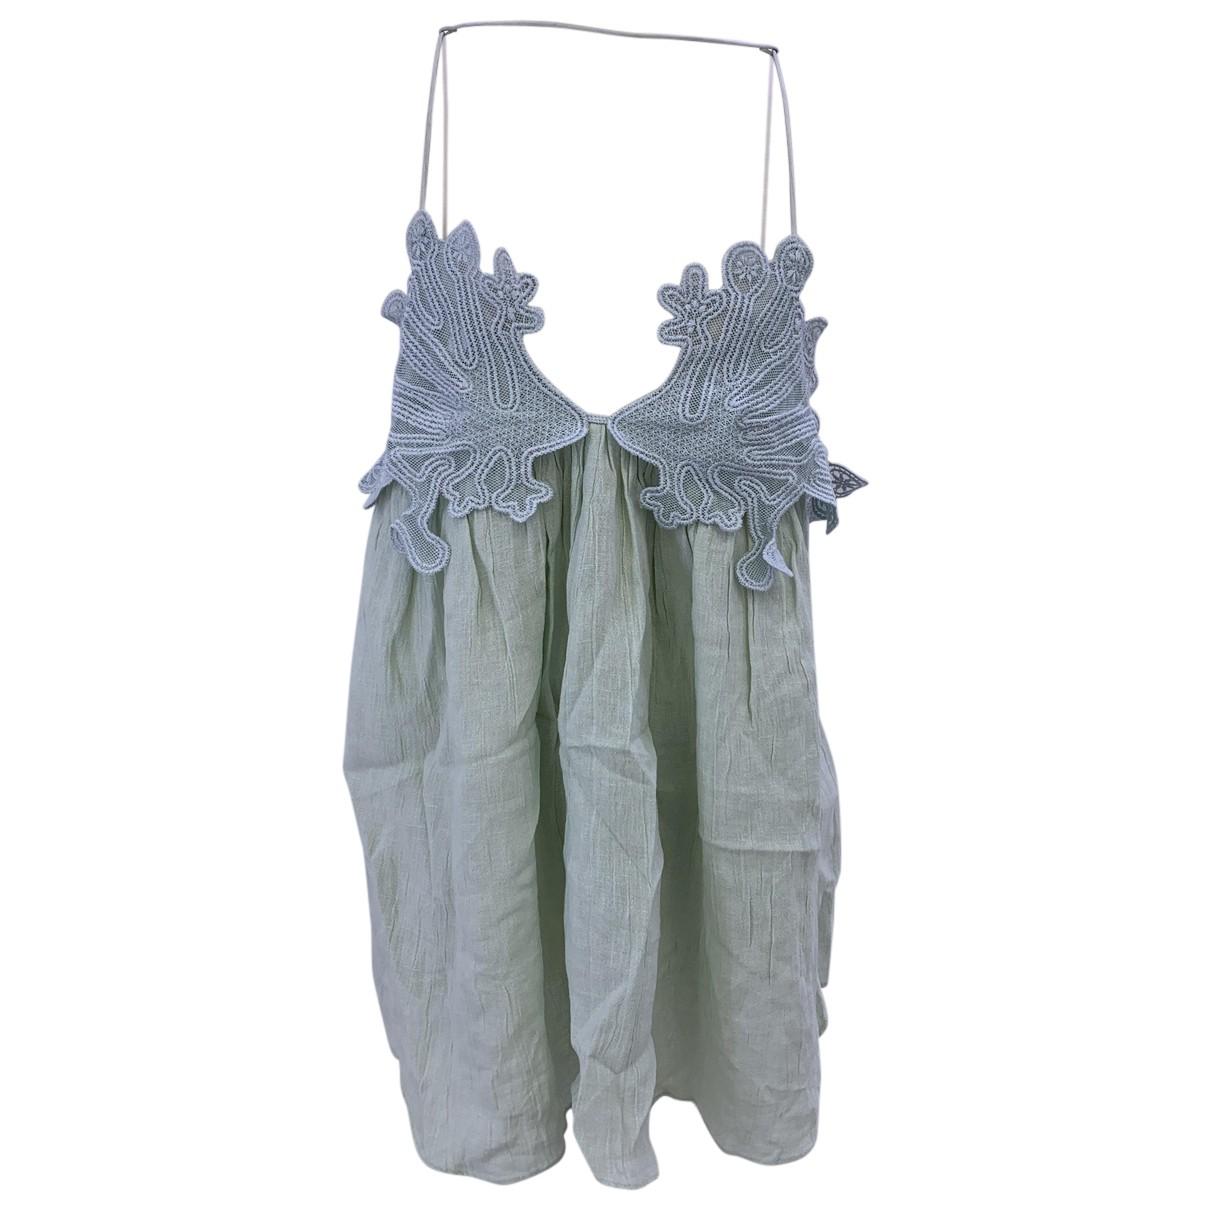 Chloe - Top   pour femme en lin - vert